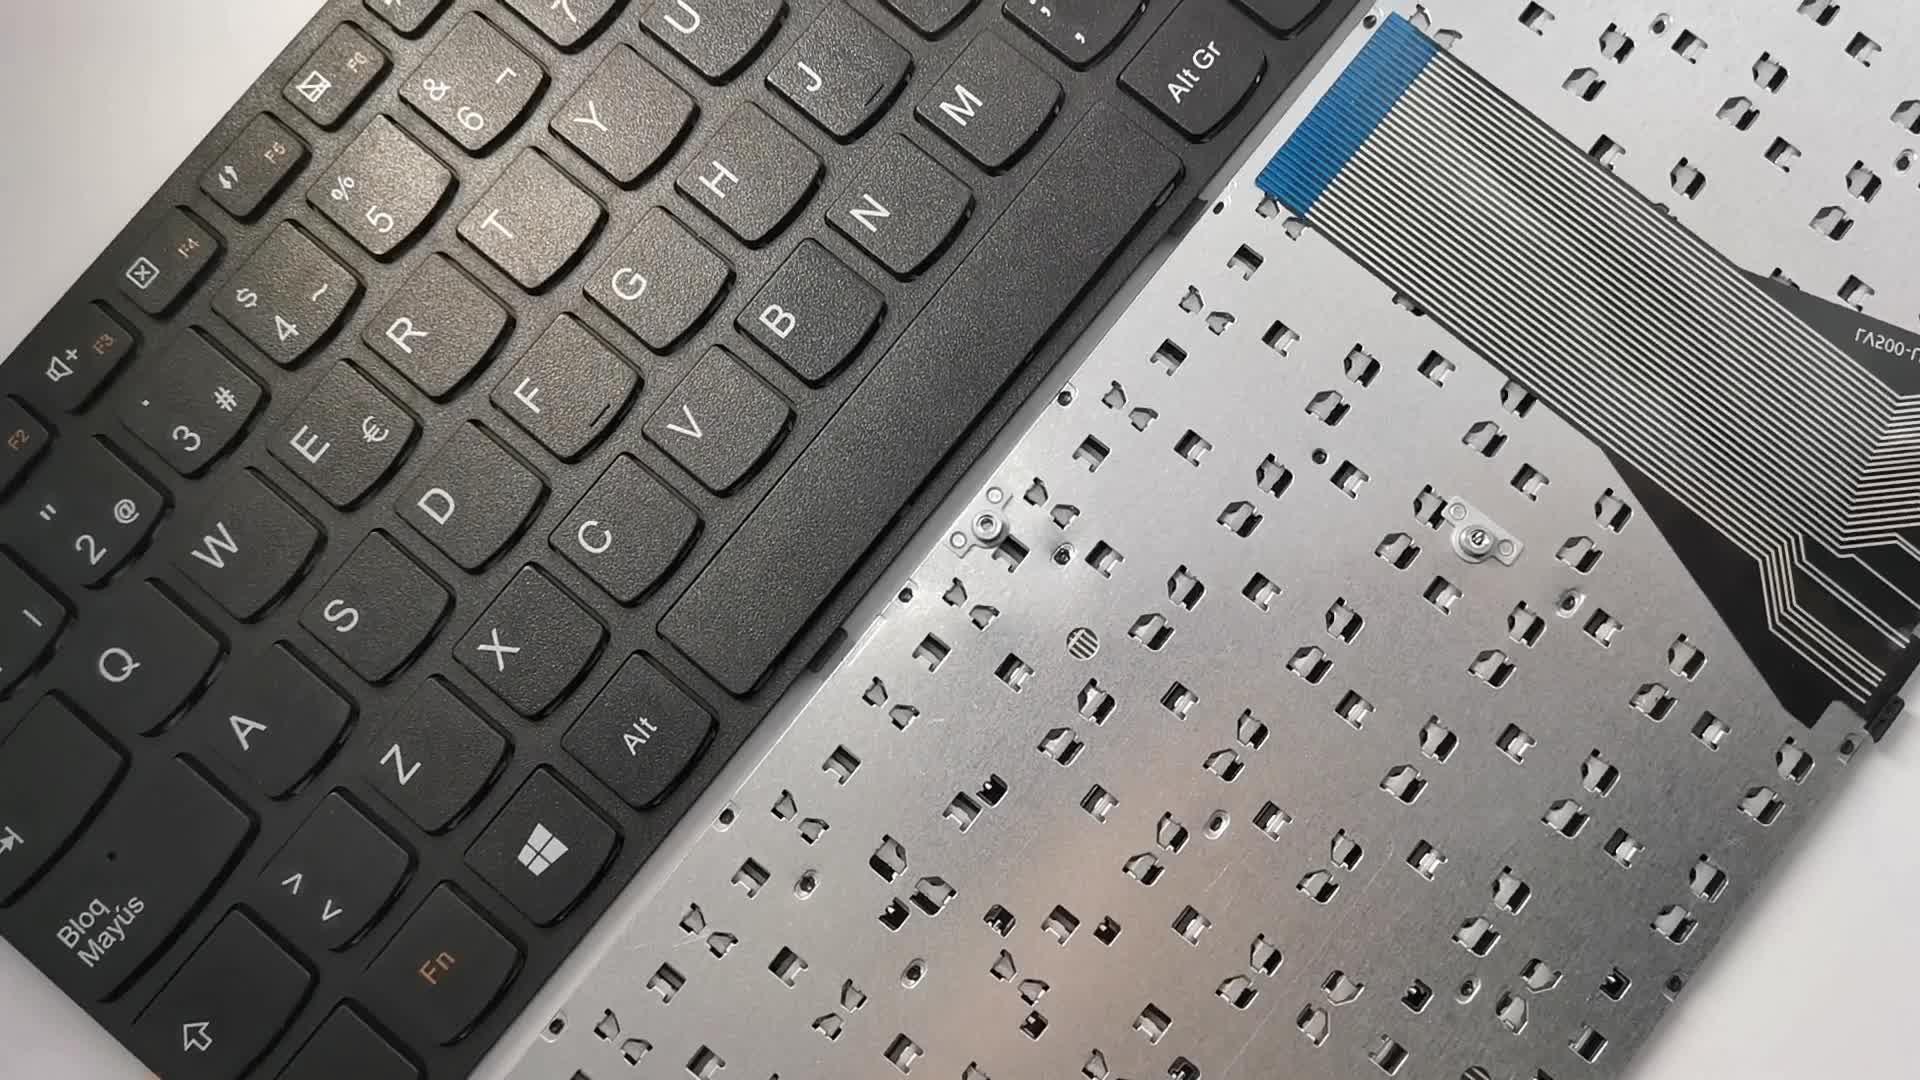 SP Spaans zwart frame laptop toetsenbord voor lenovo g50-30 g50-45 g50-70 g50-80 notebook toetsenbord